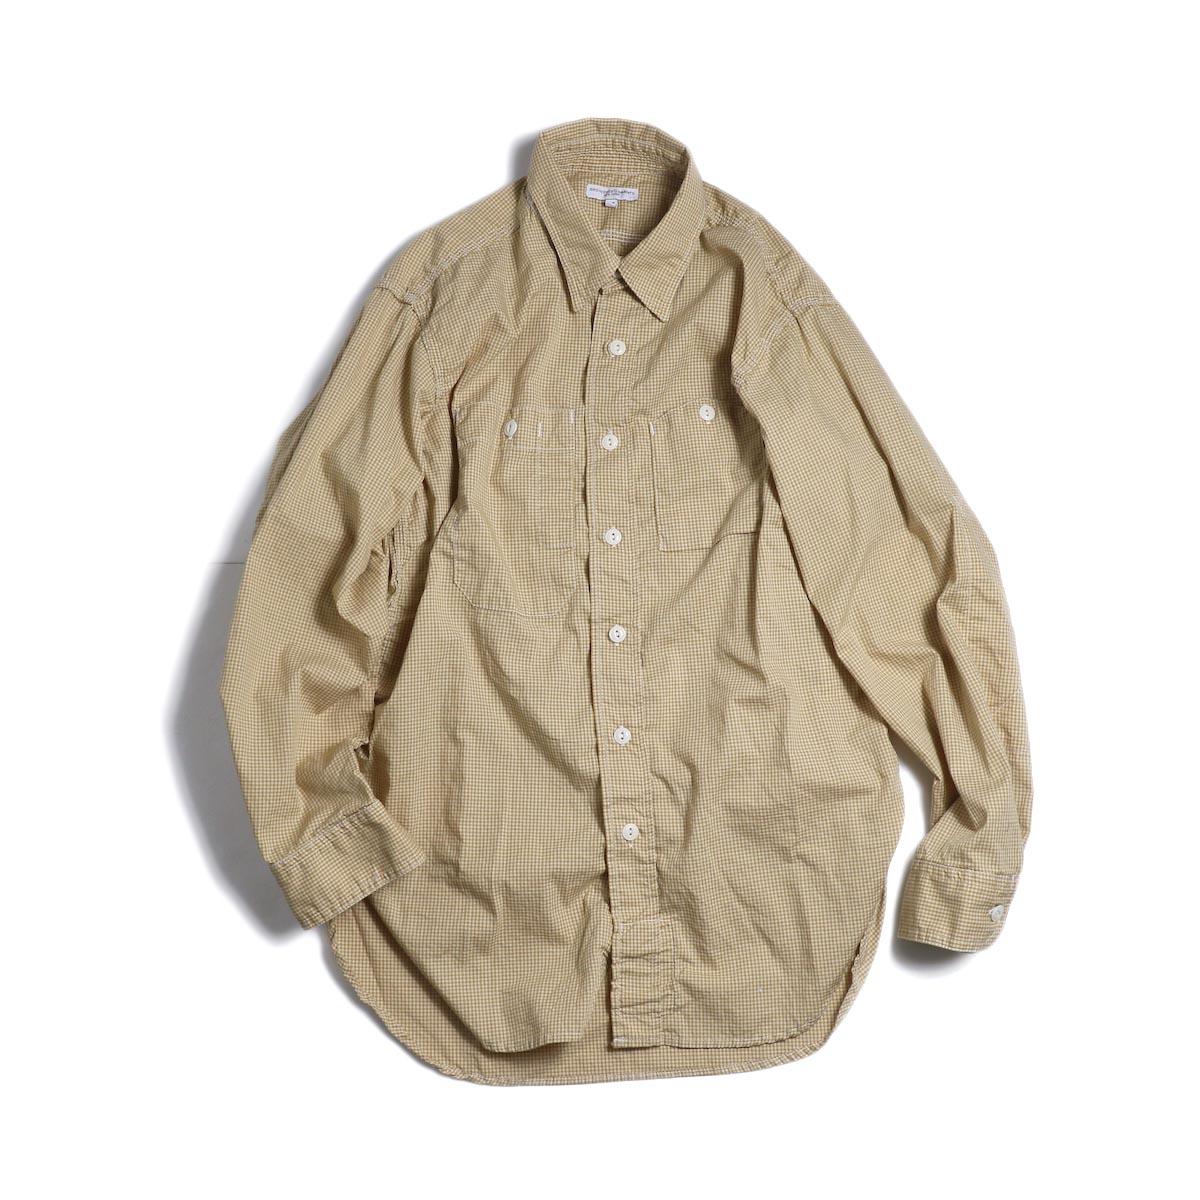 ENGINEERED GARMENTS / Work Shirt -Small Gingham Broadcloth (Gold)